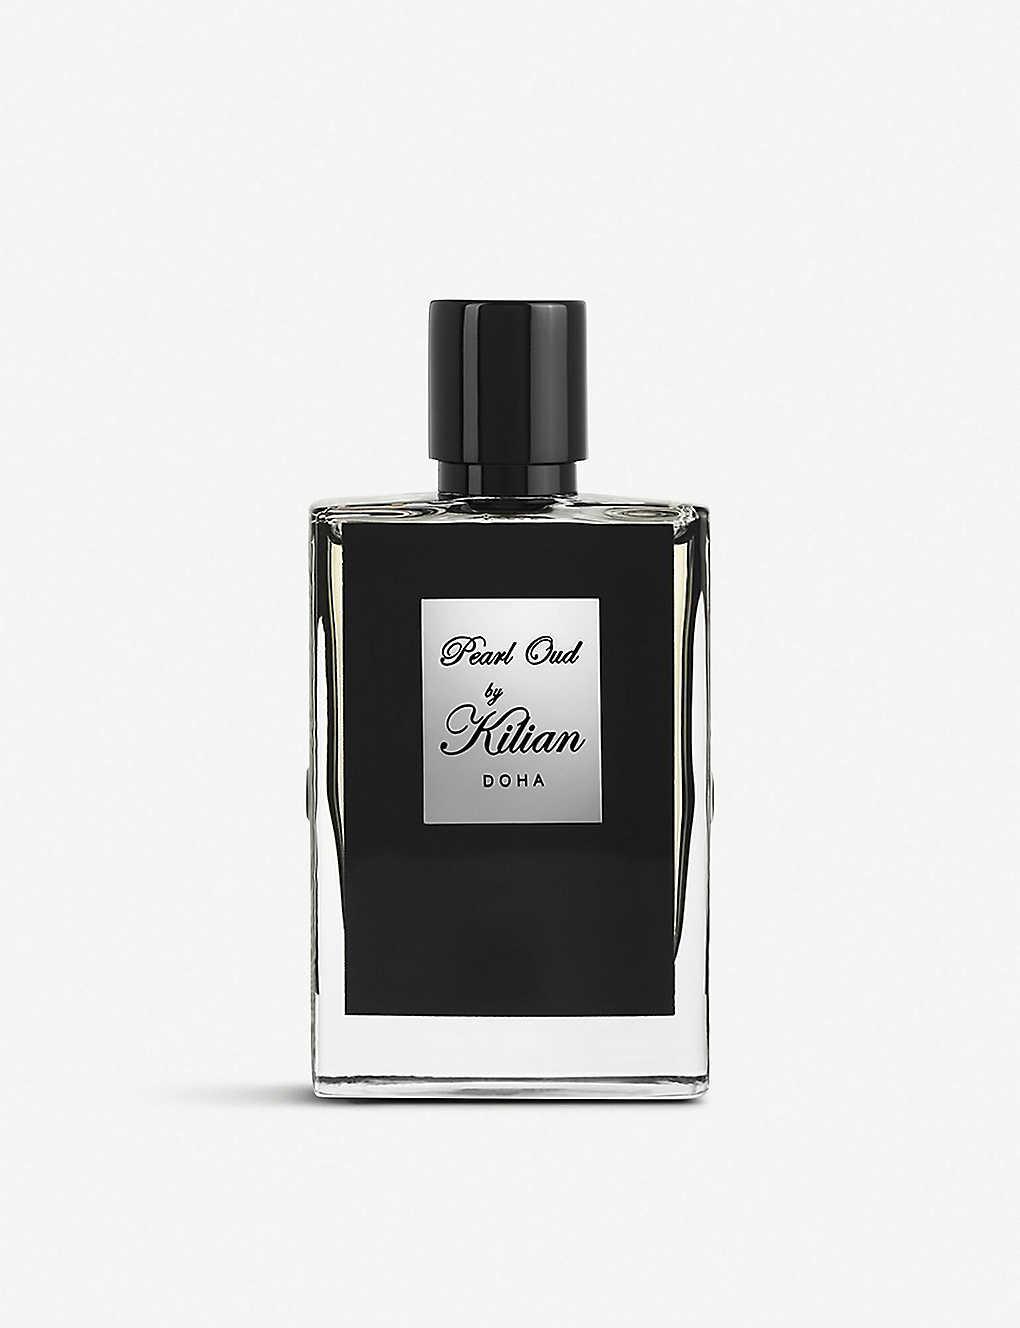 33009e426 KILIAN - Pearl Oud Doha Eau De Parfum Refillable Spray 50ml ...